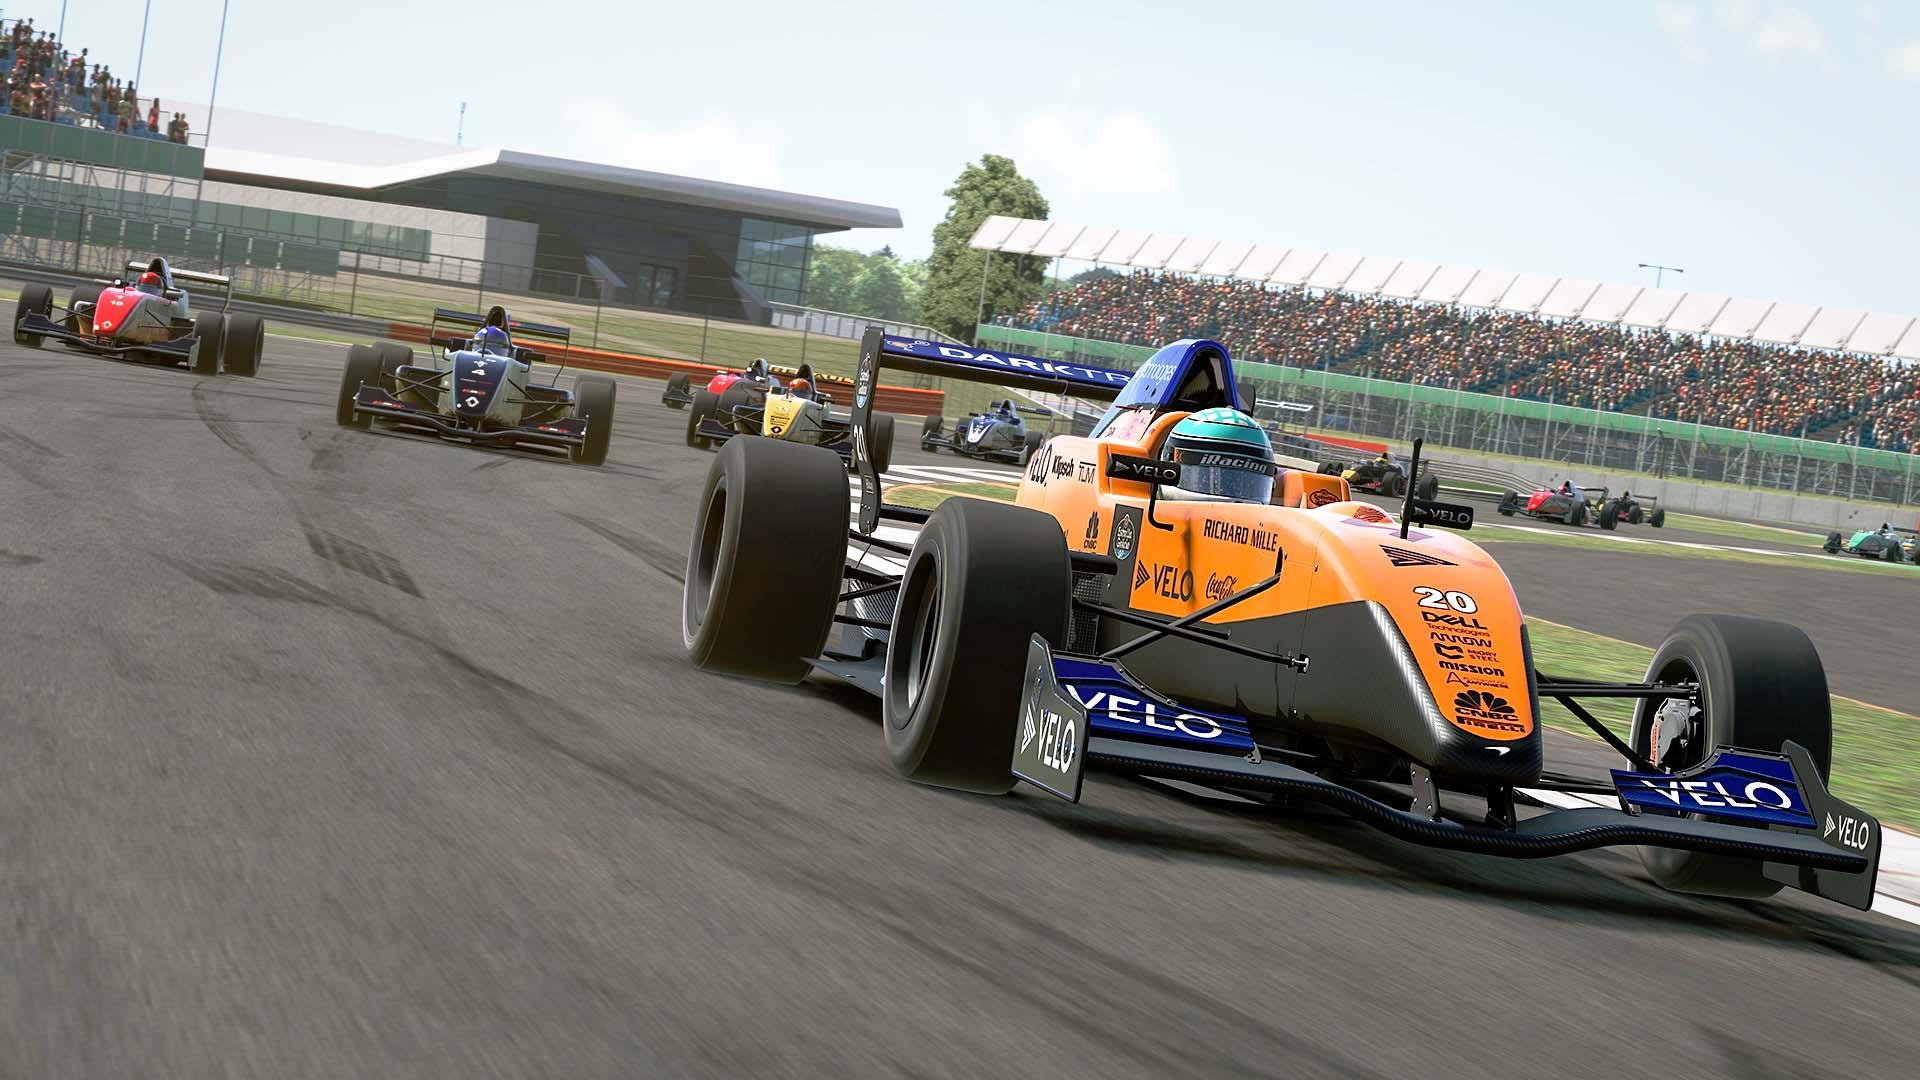 Announcement – ARA Formula Renault 2.0 Championship Season 1